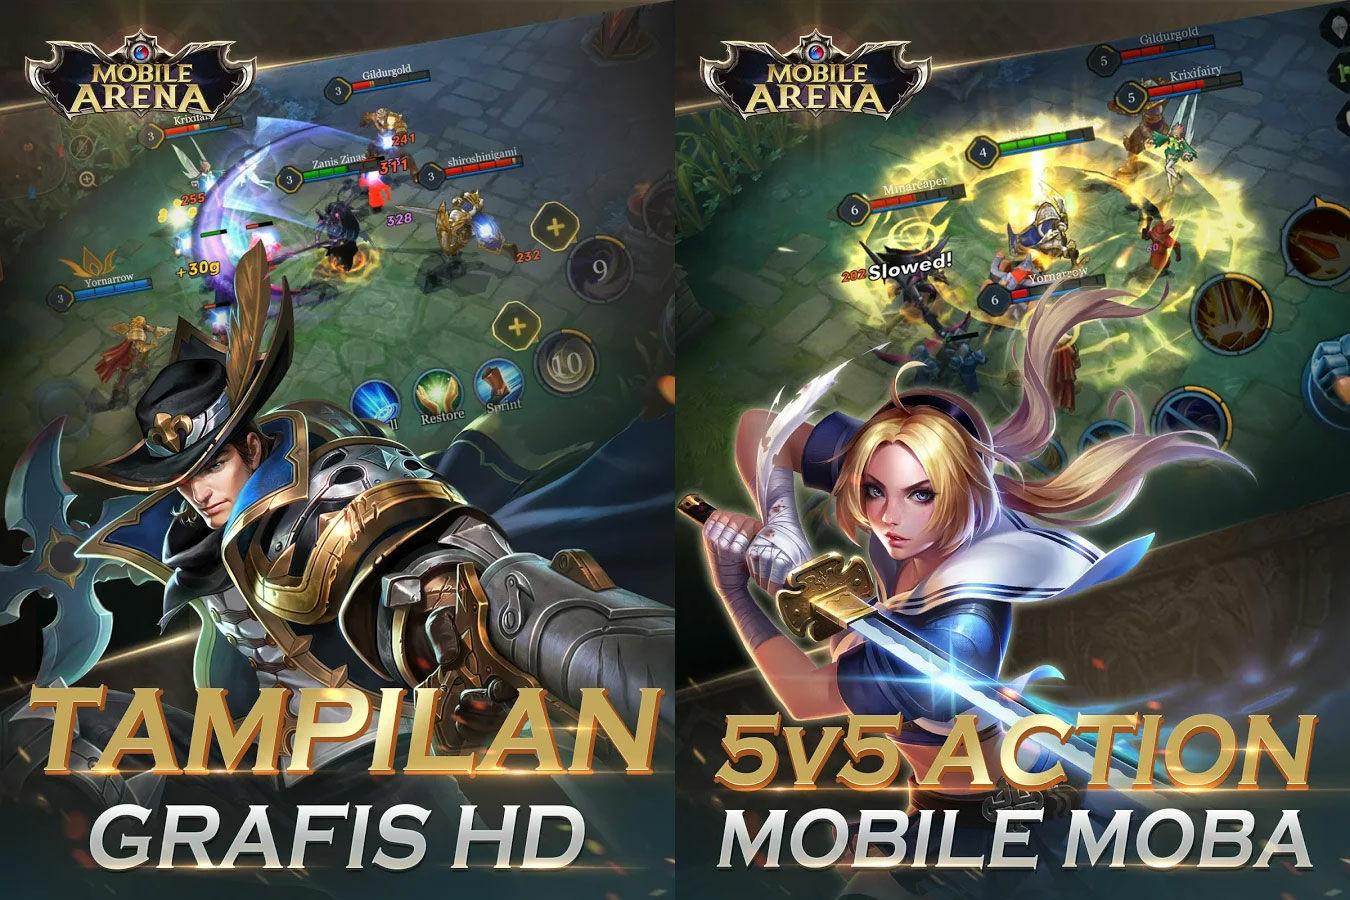 Mobile Arena Action Moba